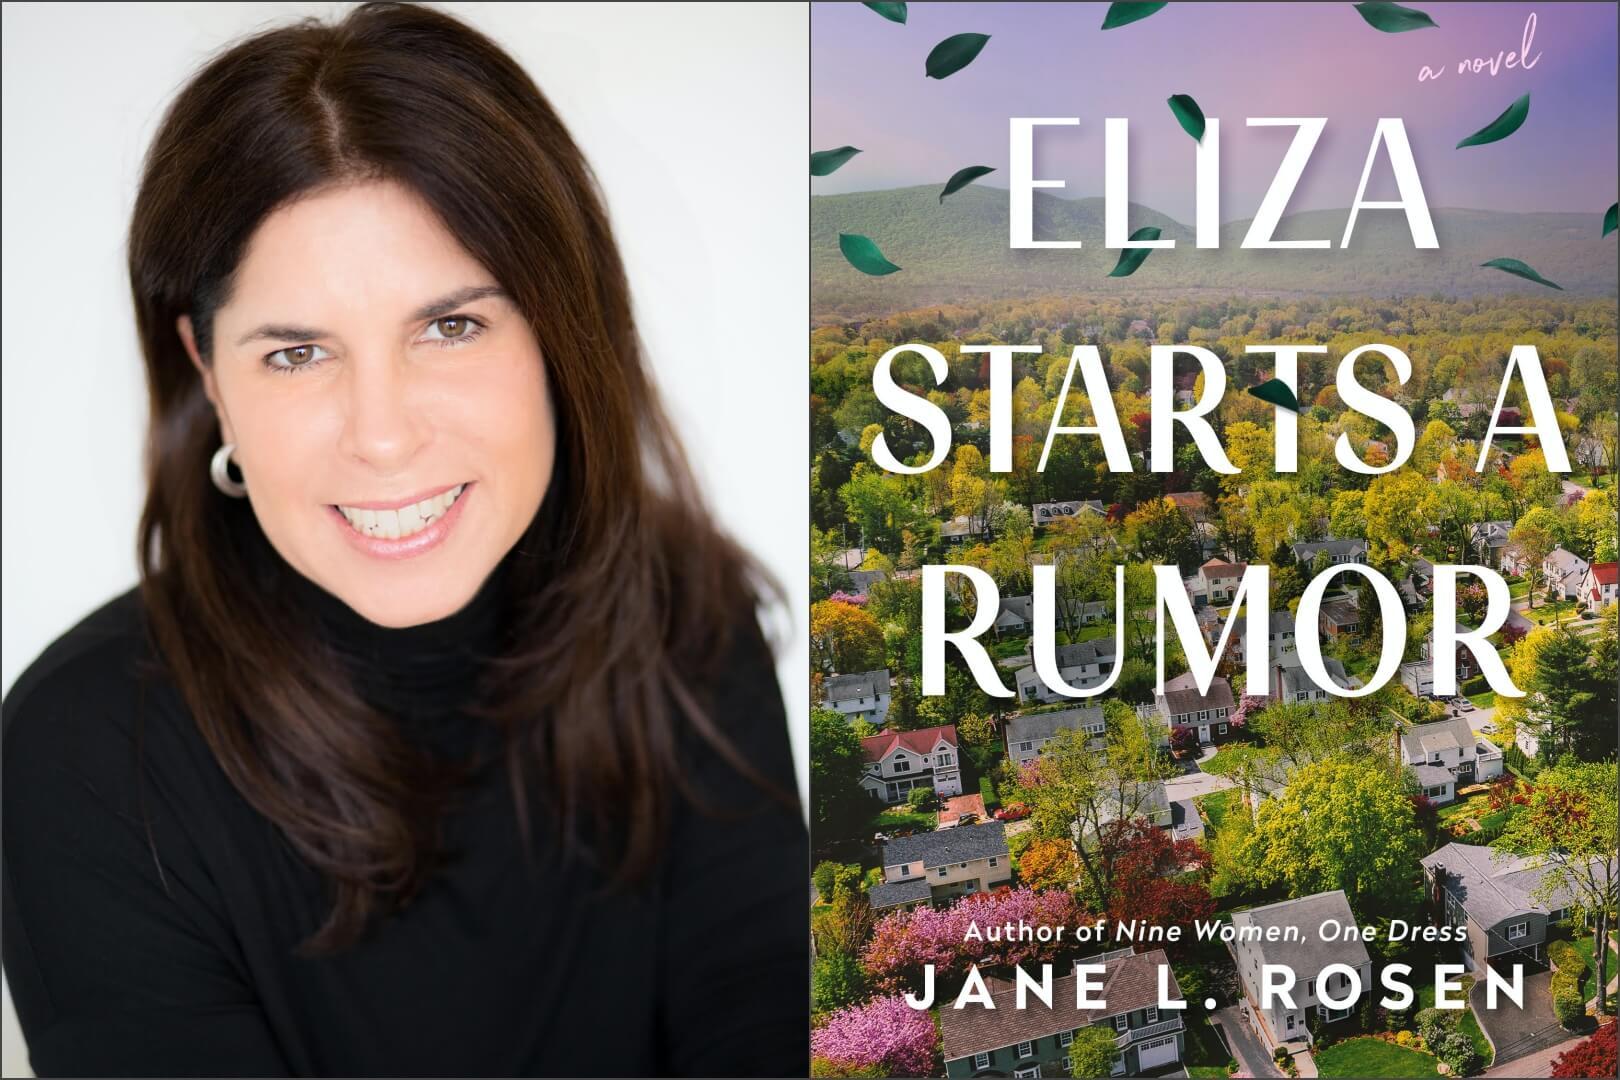 jane l rosen interview - book club chat